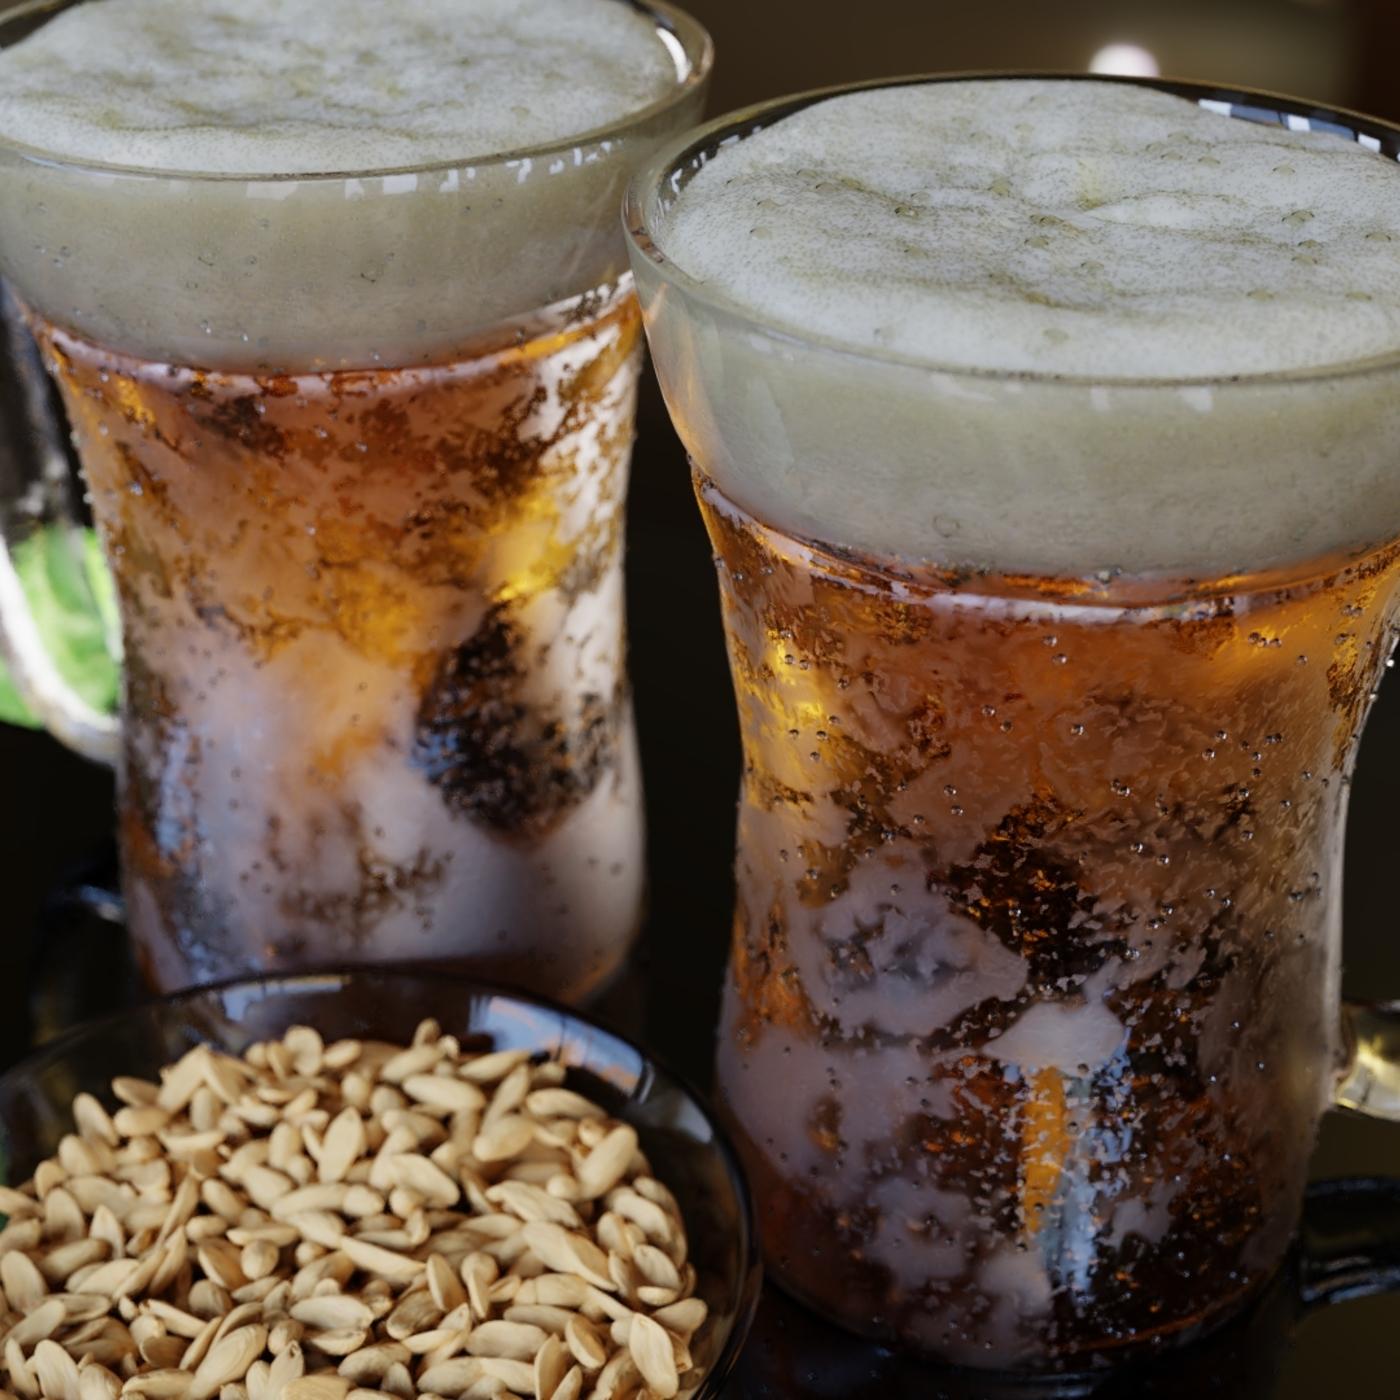 Beer Mugs with Peanuts Bowl